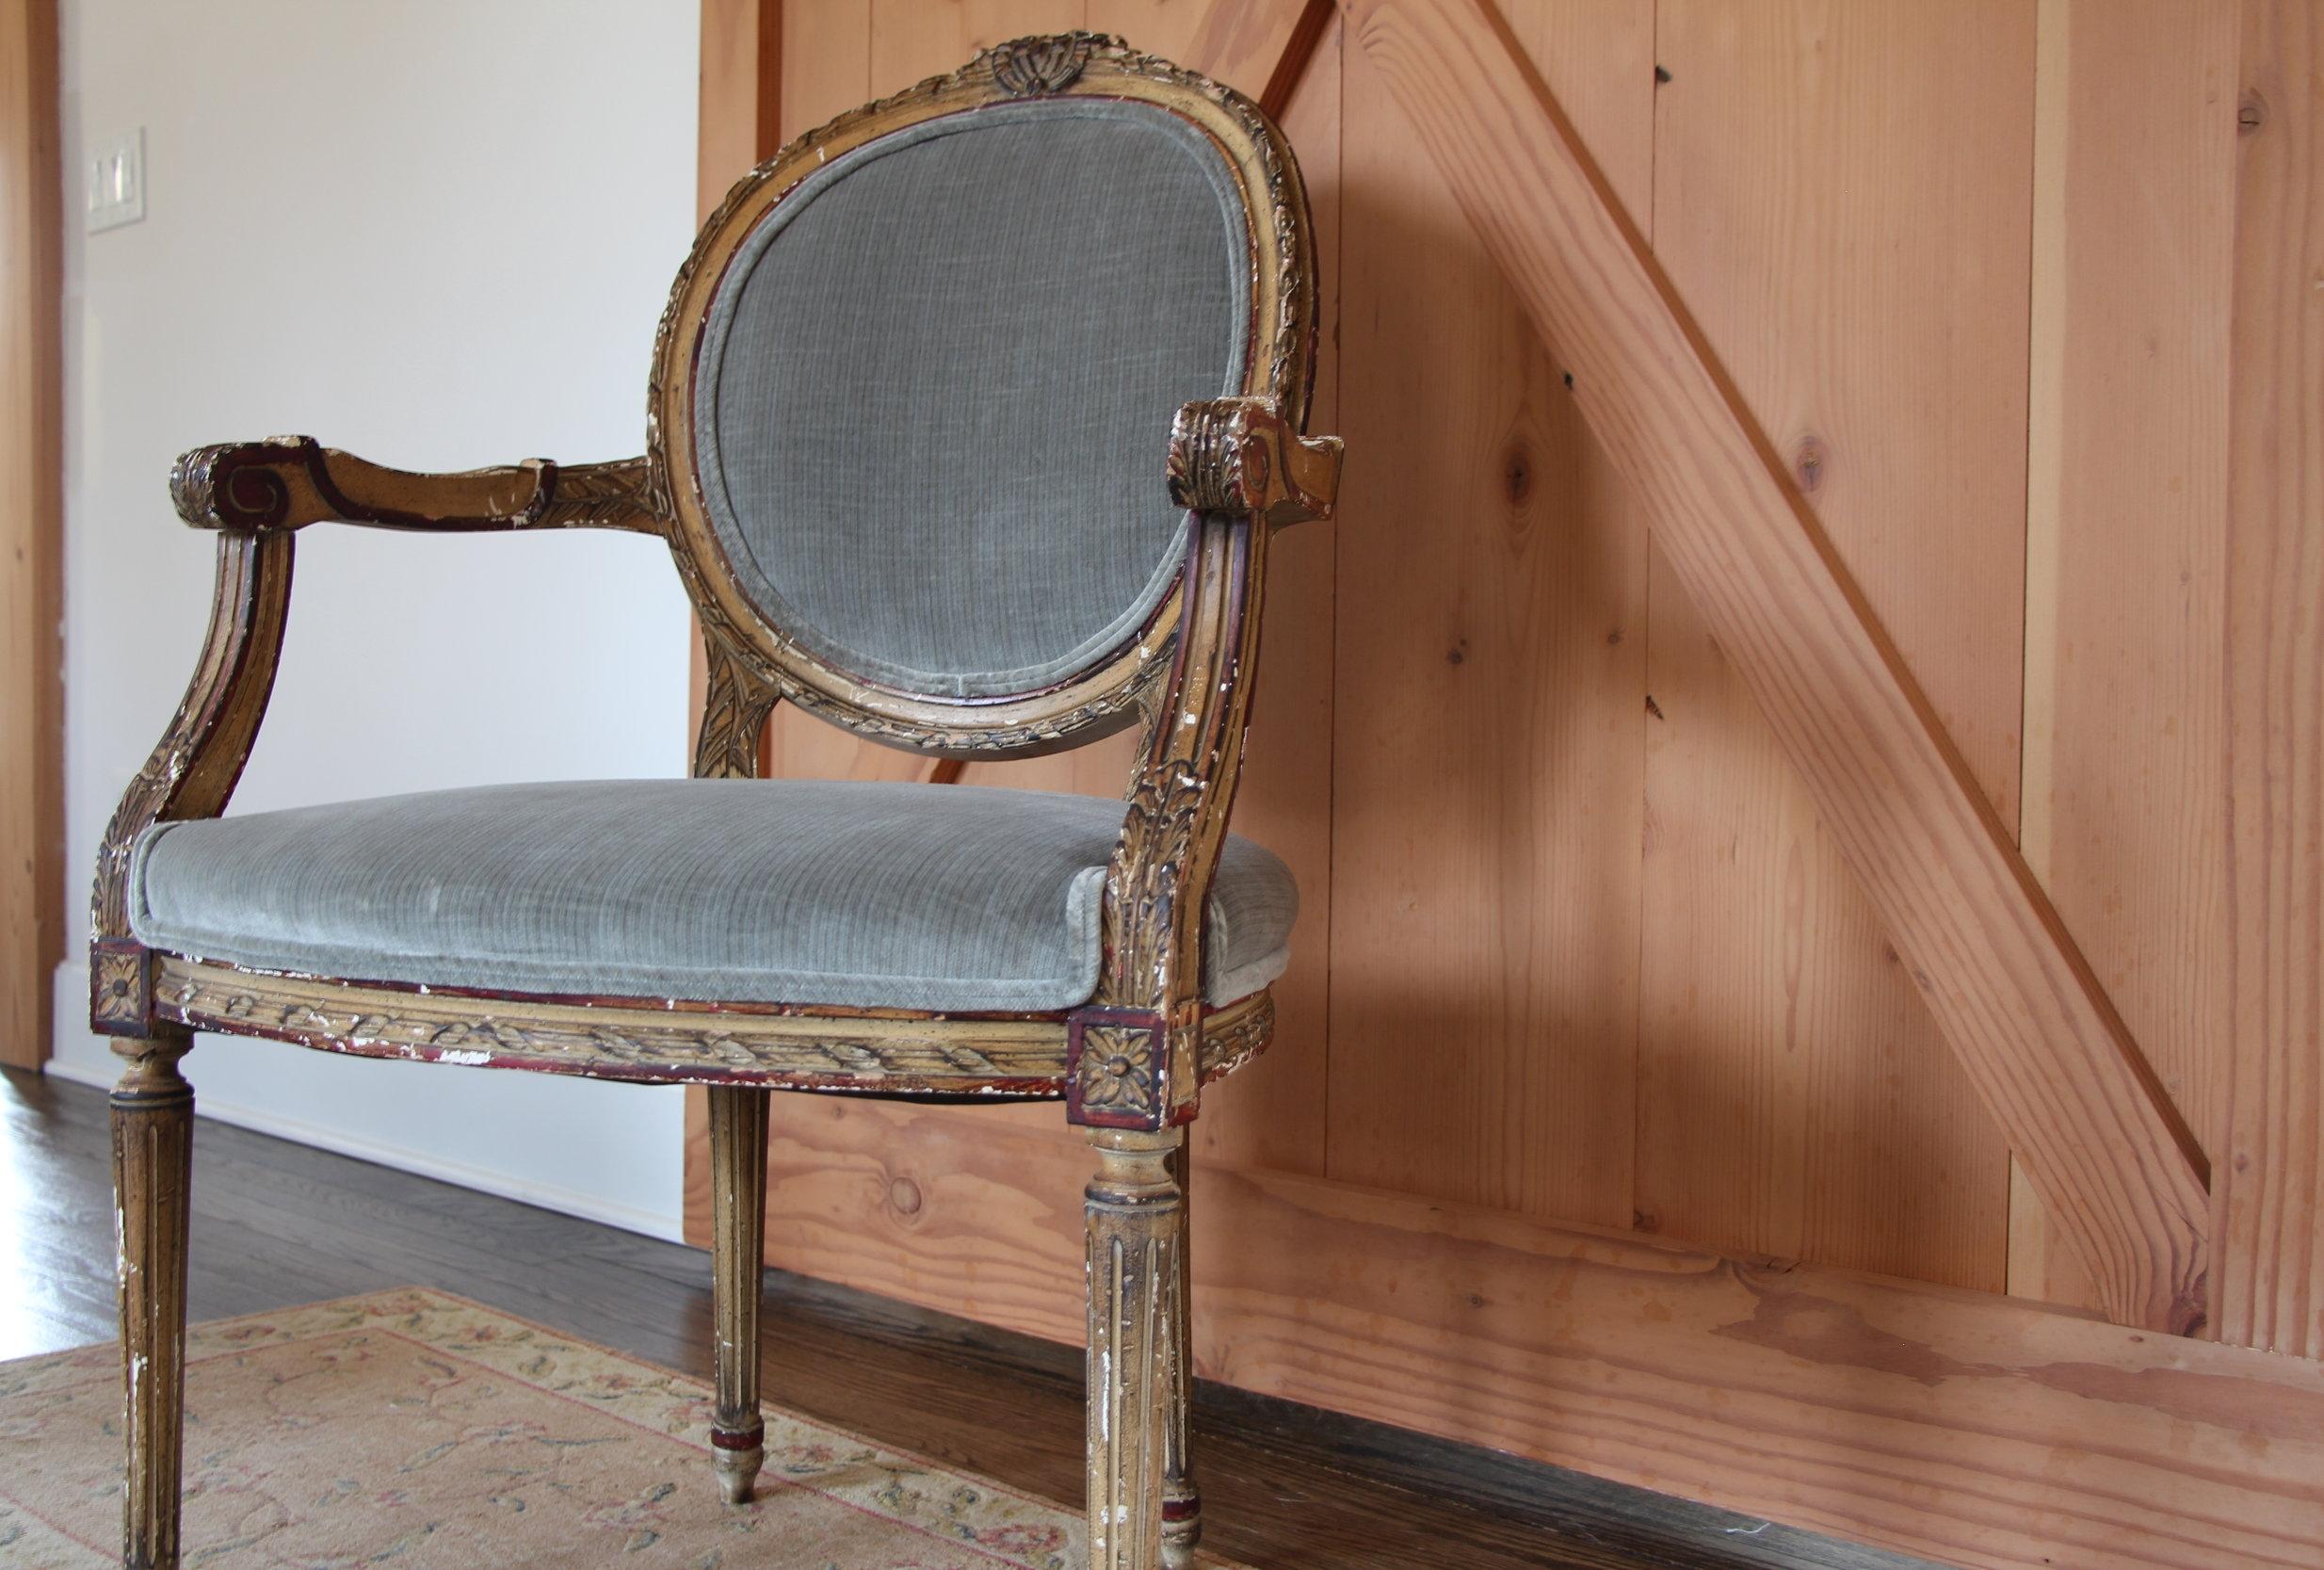 Louis chair, upholstered in Robert Allen's Strie Velvet, Zinc